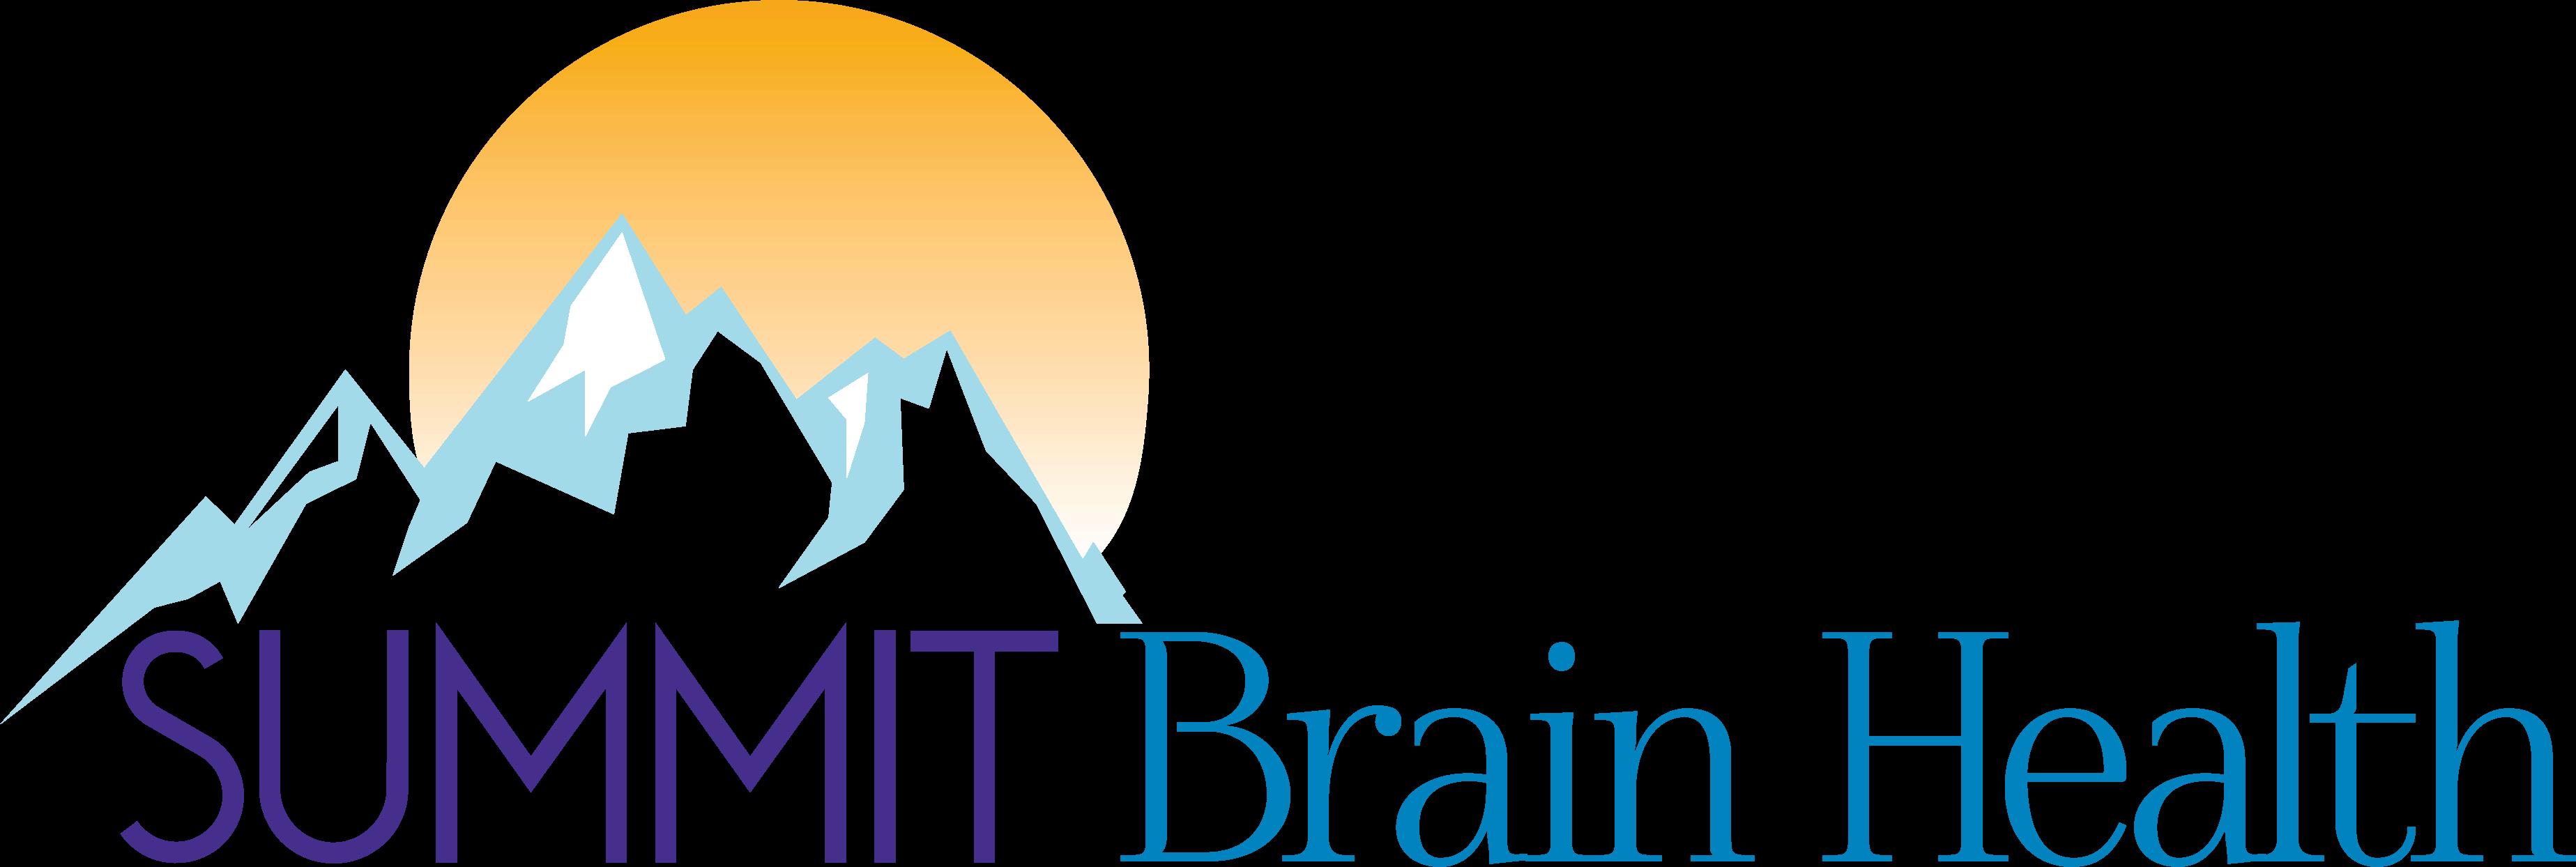 Summit Brain Health Logo Horizontal